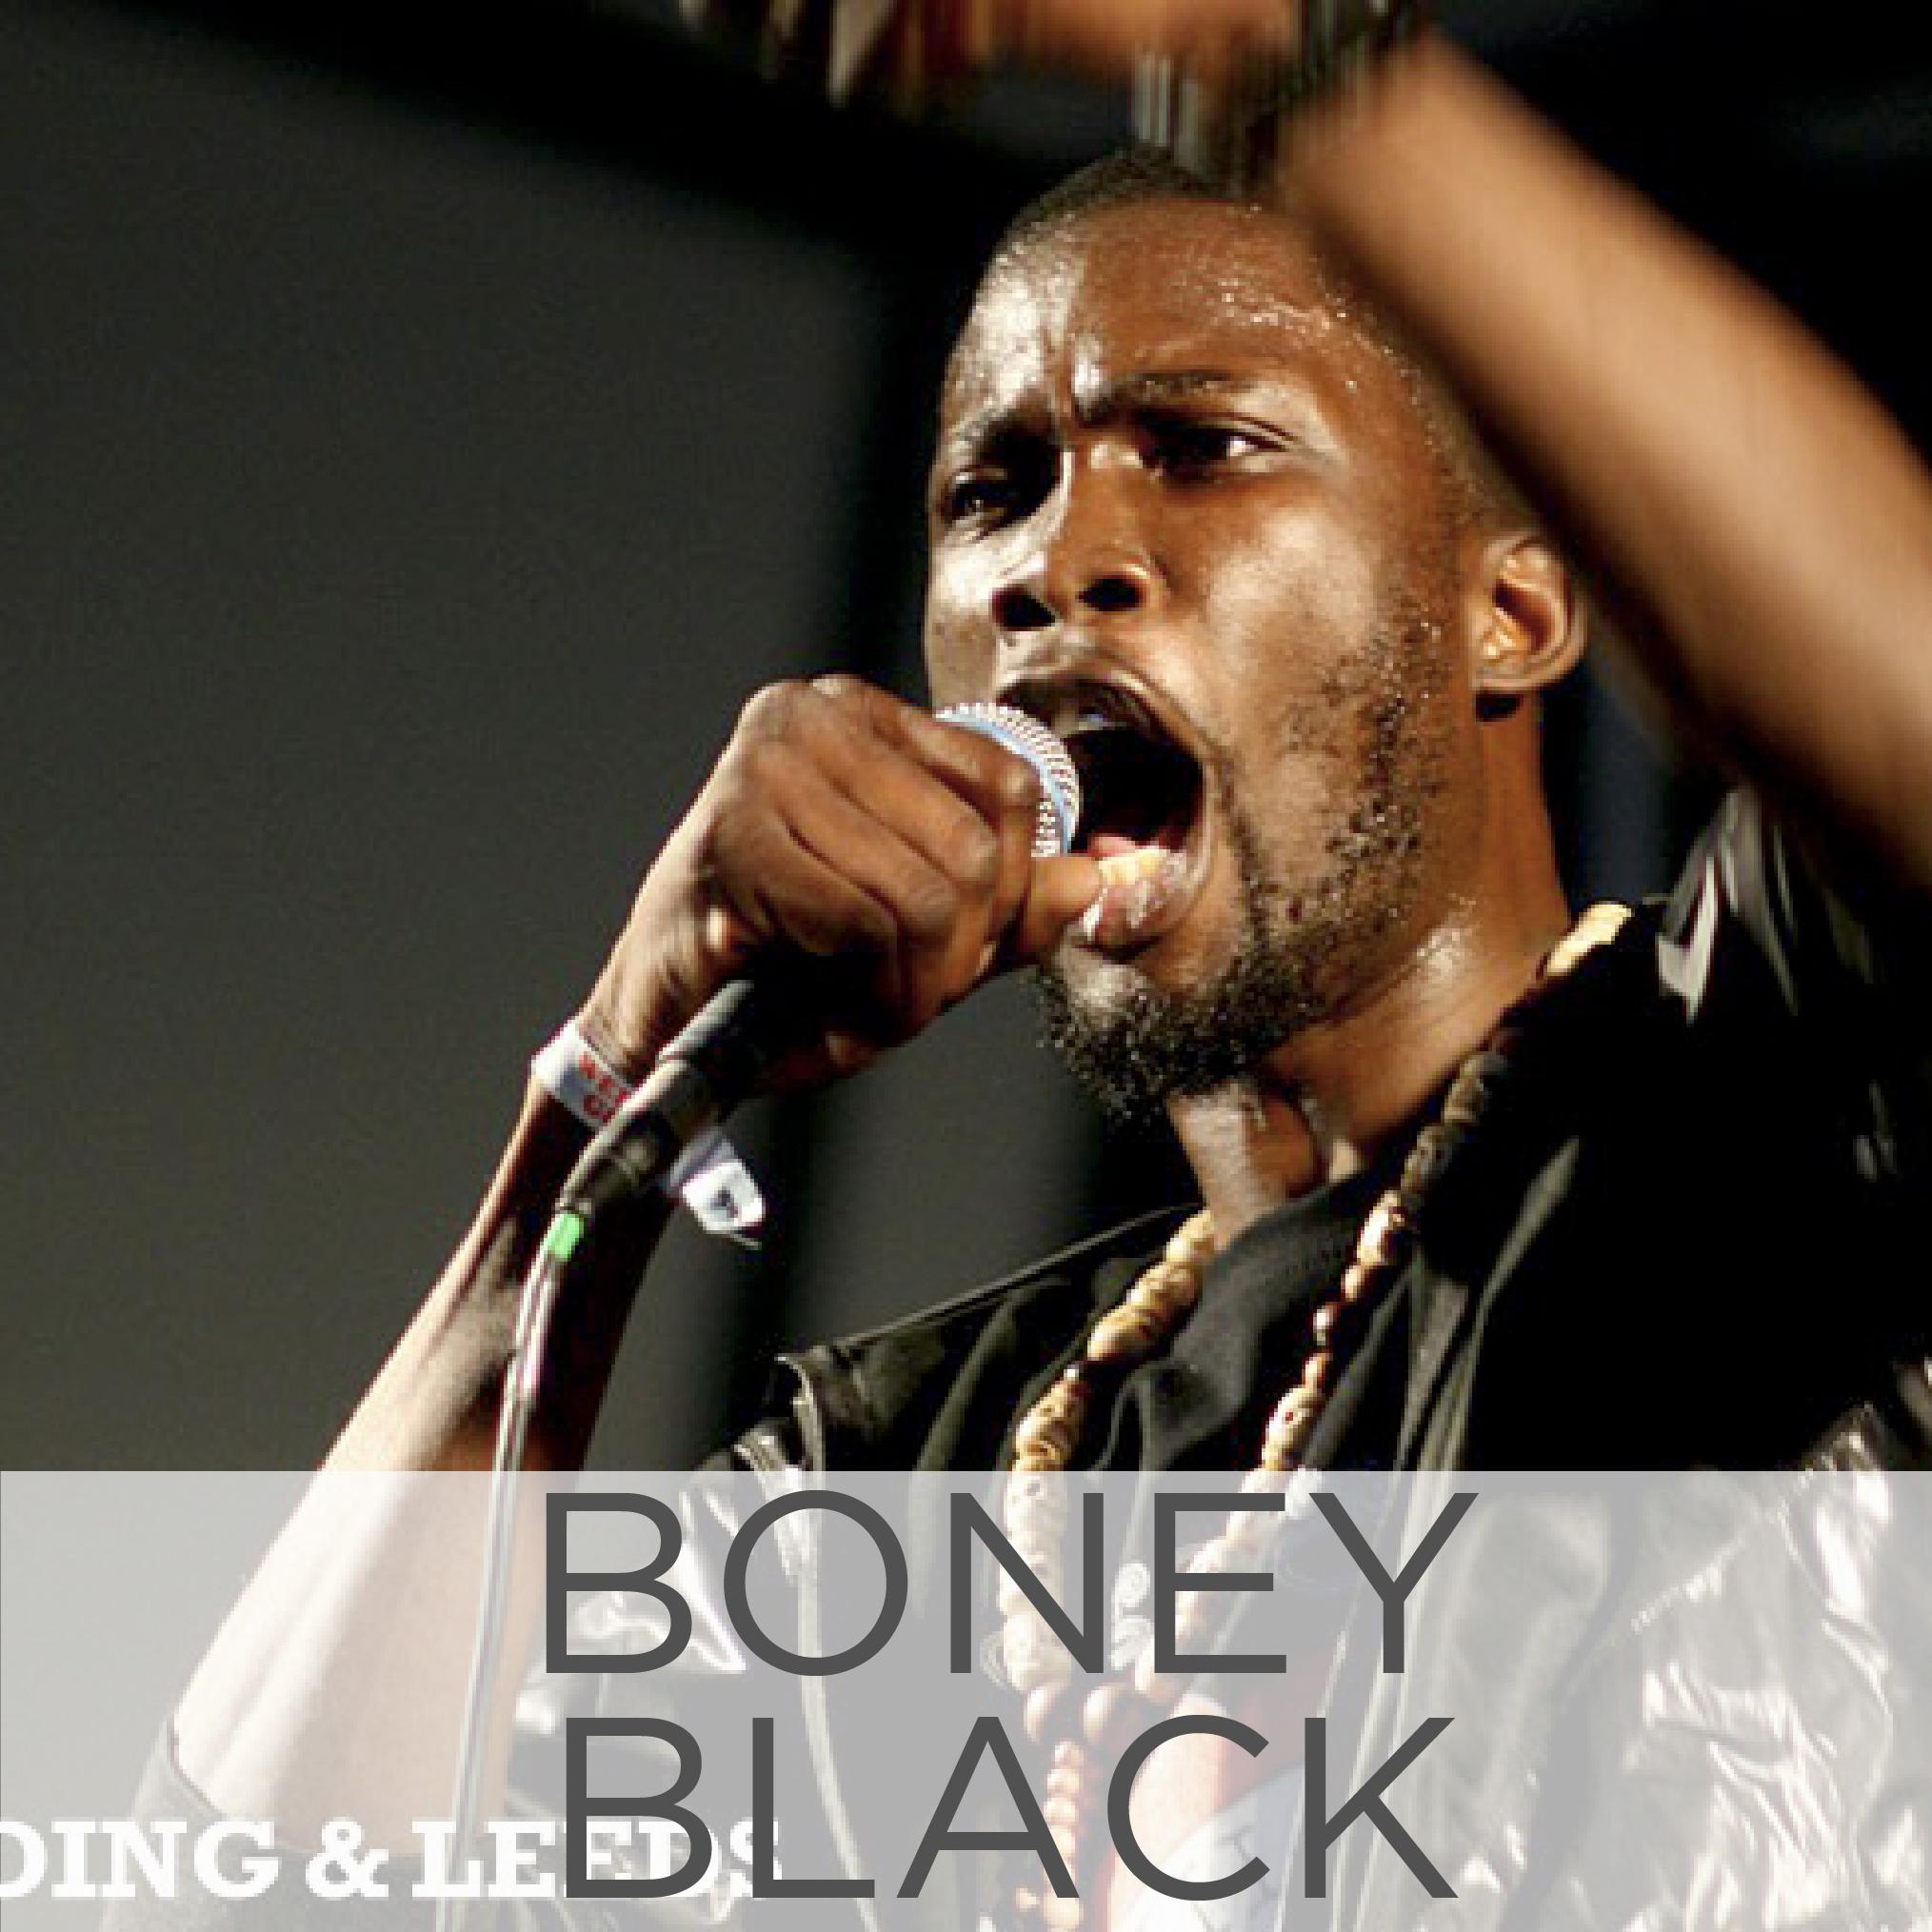 Boney Black